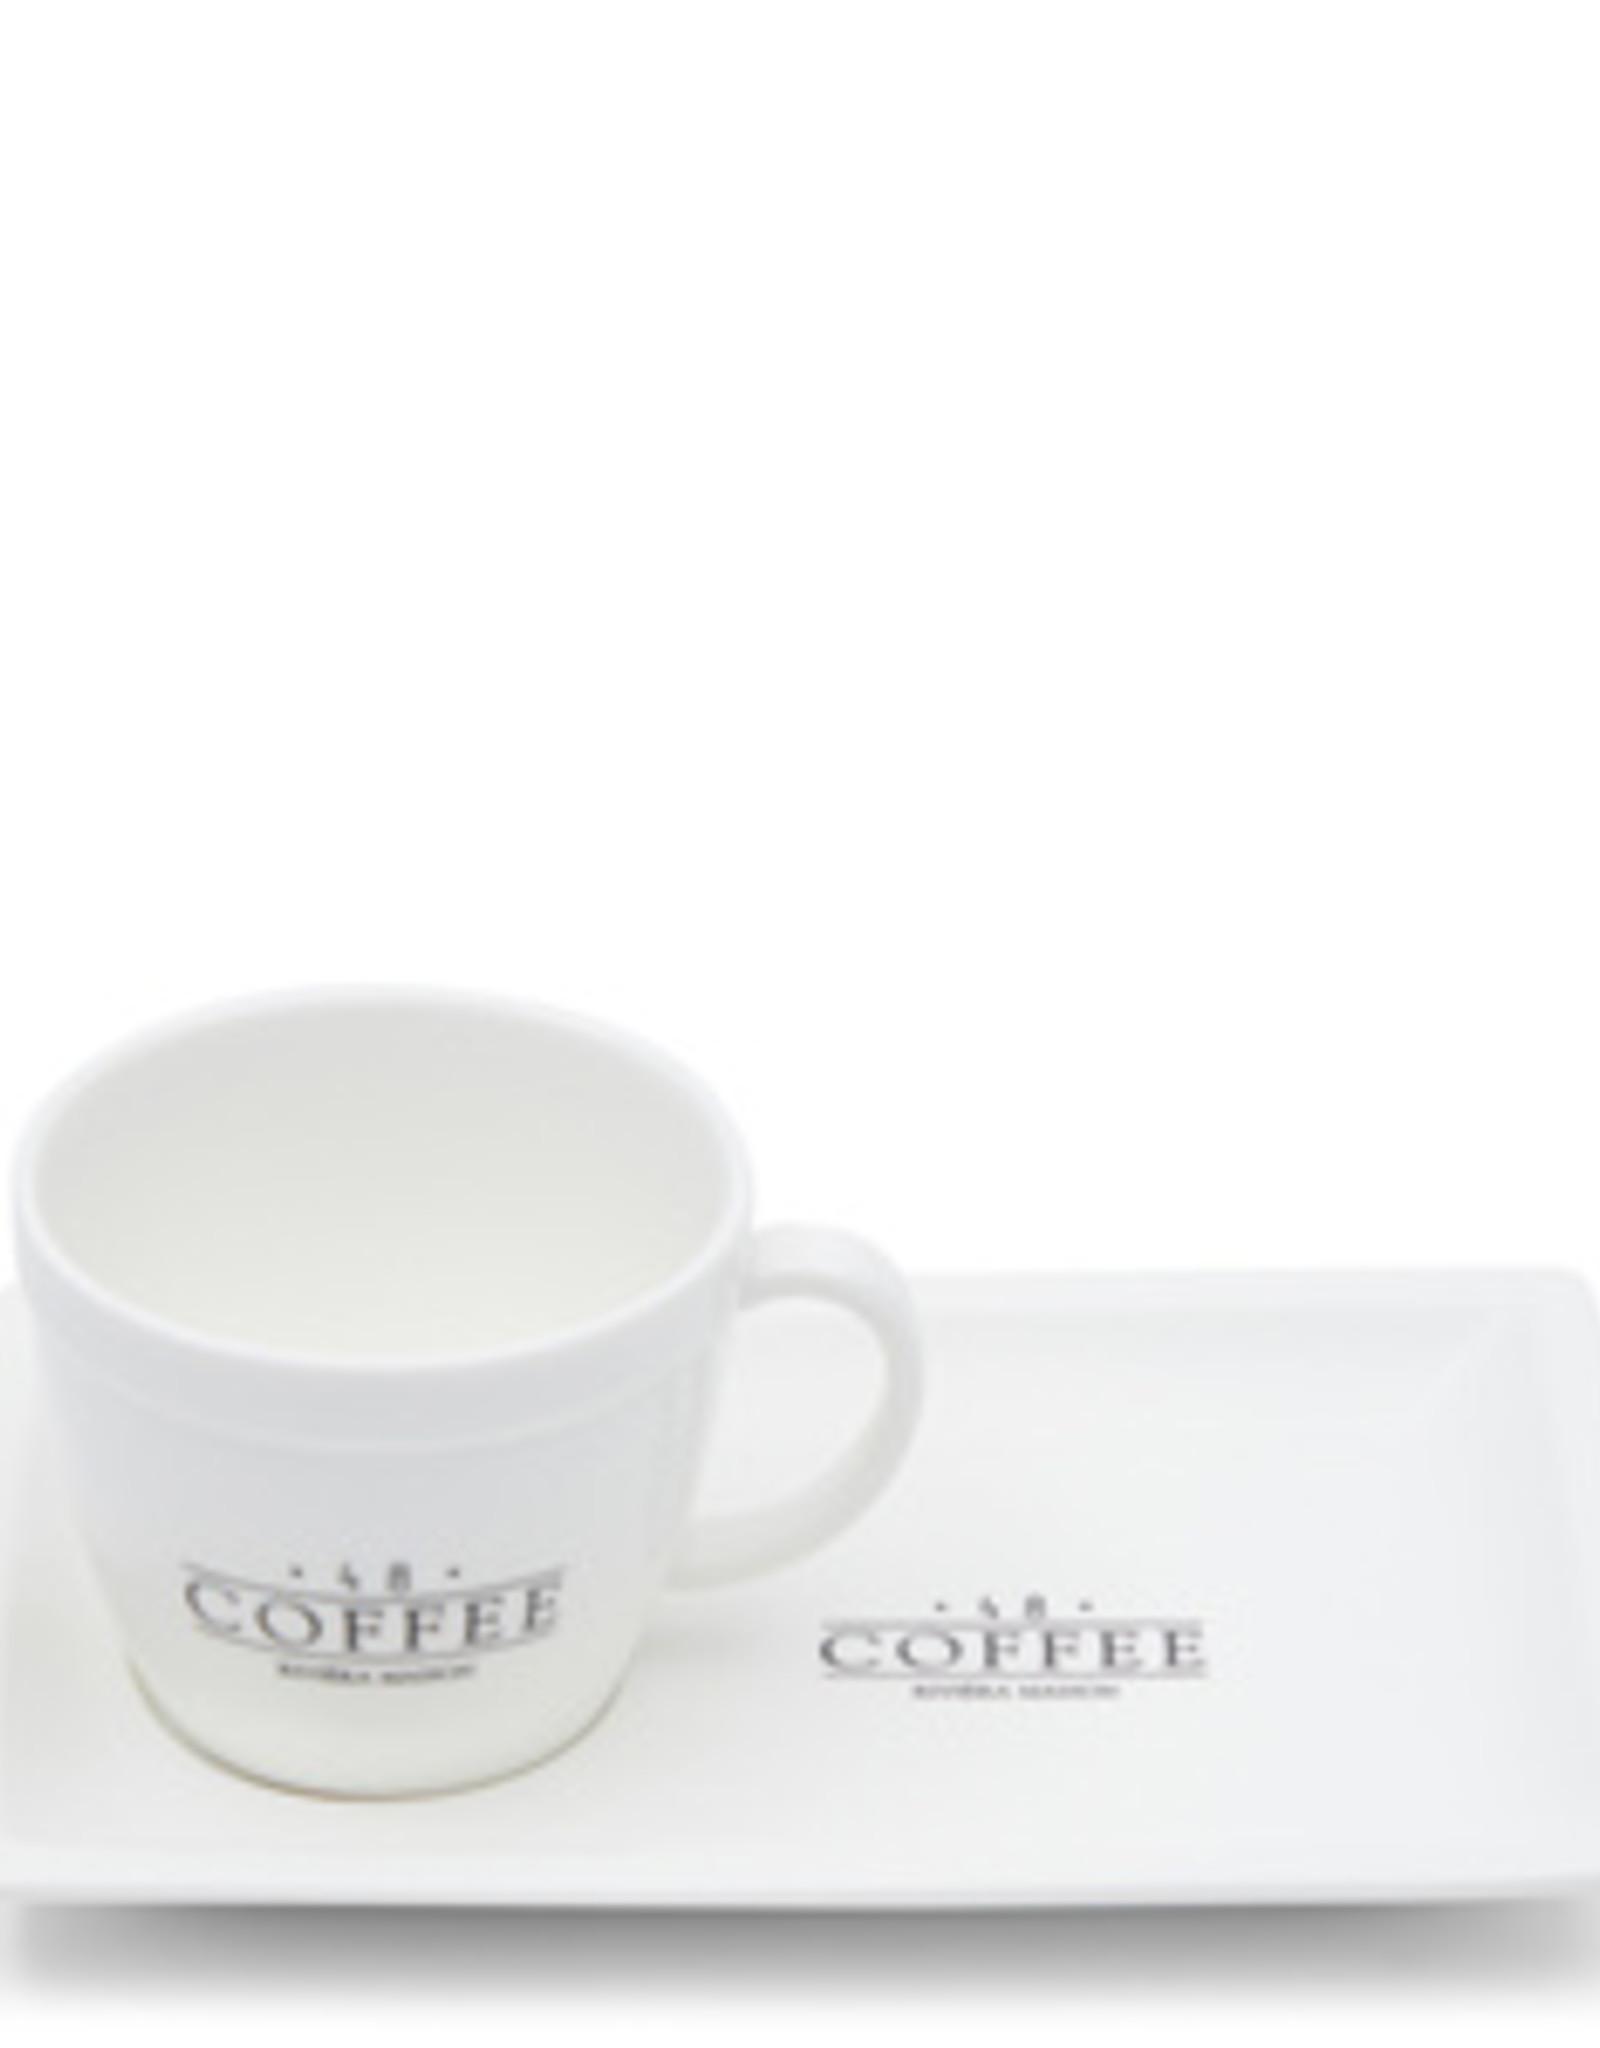 Riviera Maison RM 48 Coffee